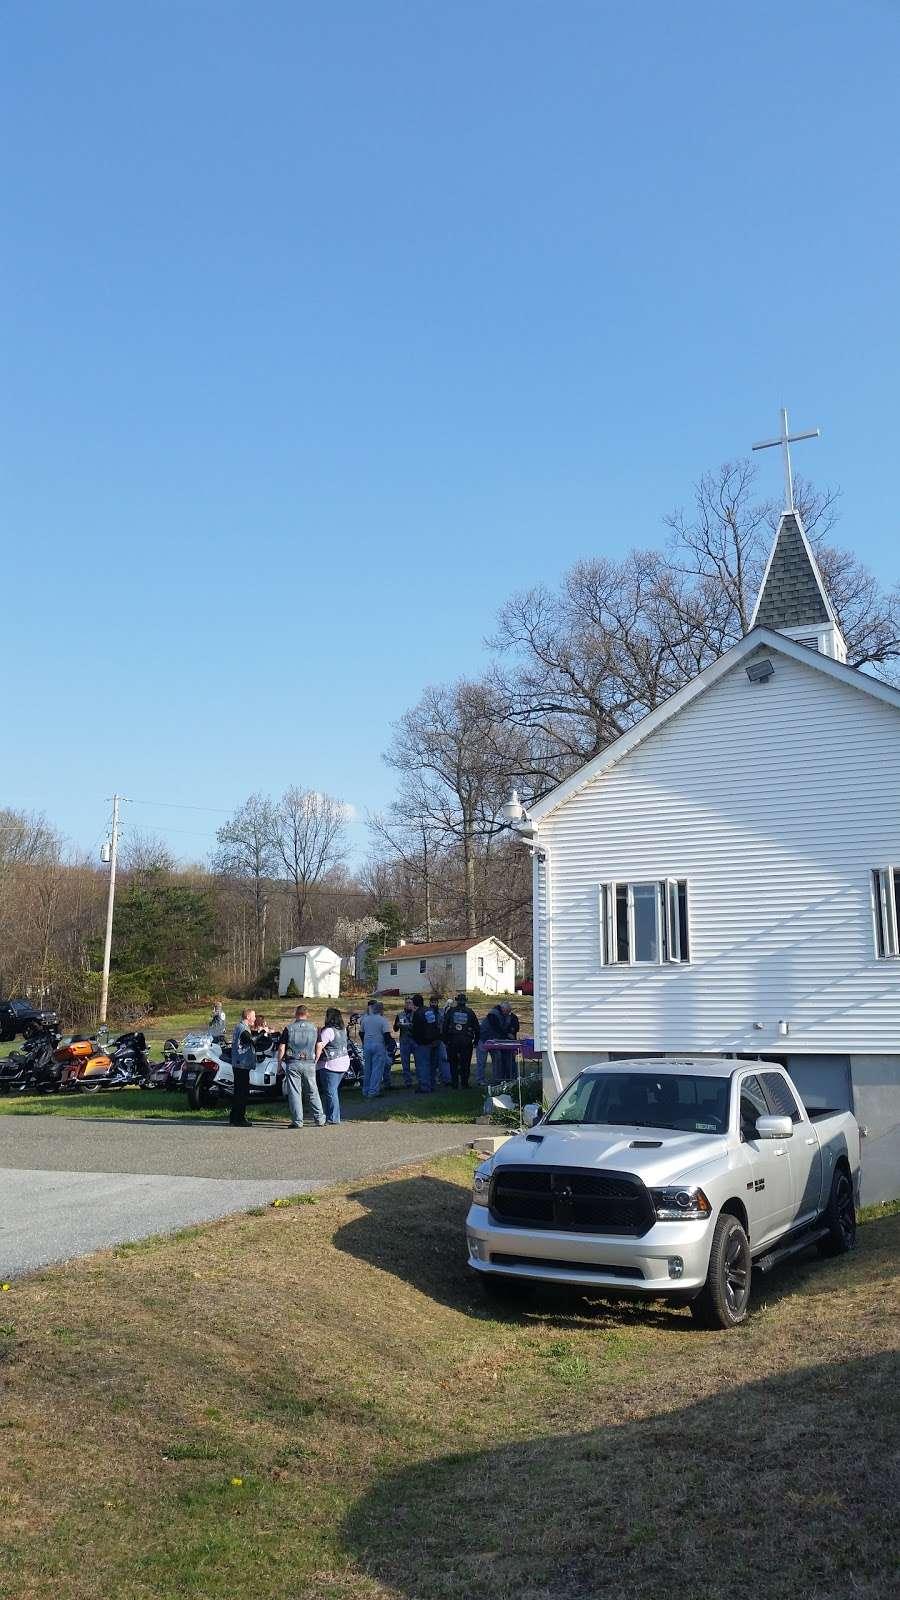 The Biker CHURCH - church  | Photo 4 of 10 | Address: 36-98 Chapel Ln, Boyertown, PA 19512, USA | Phone: (610) 367-7570